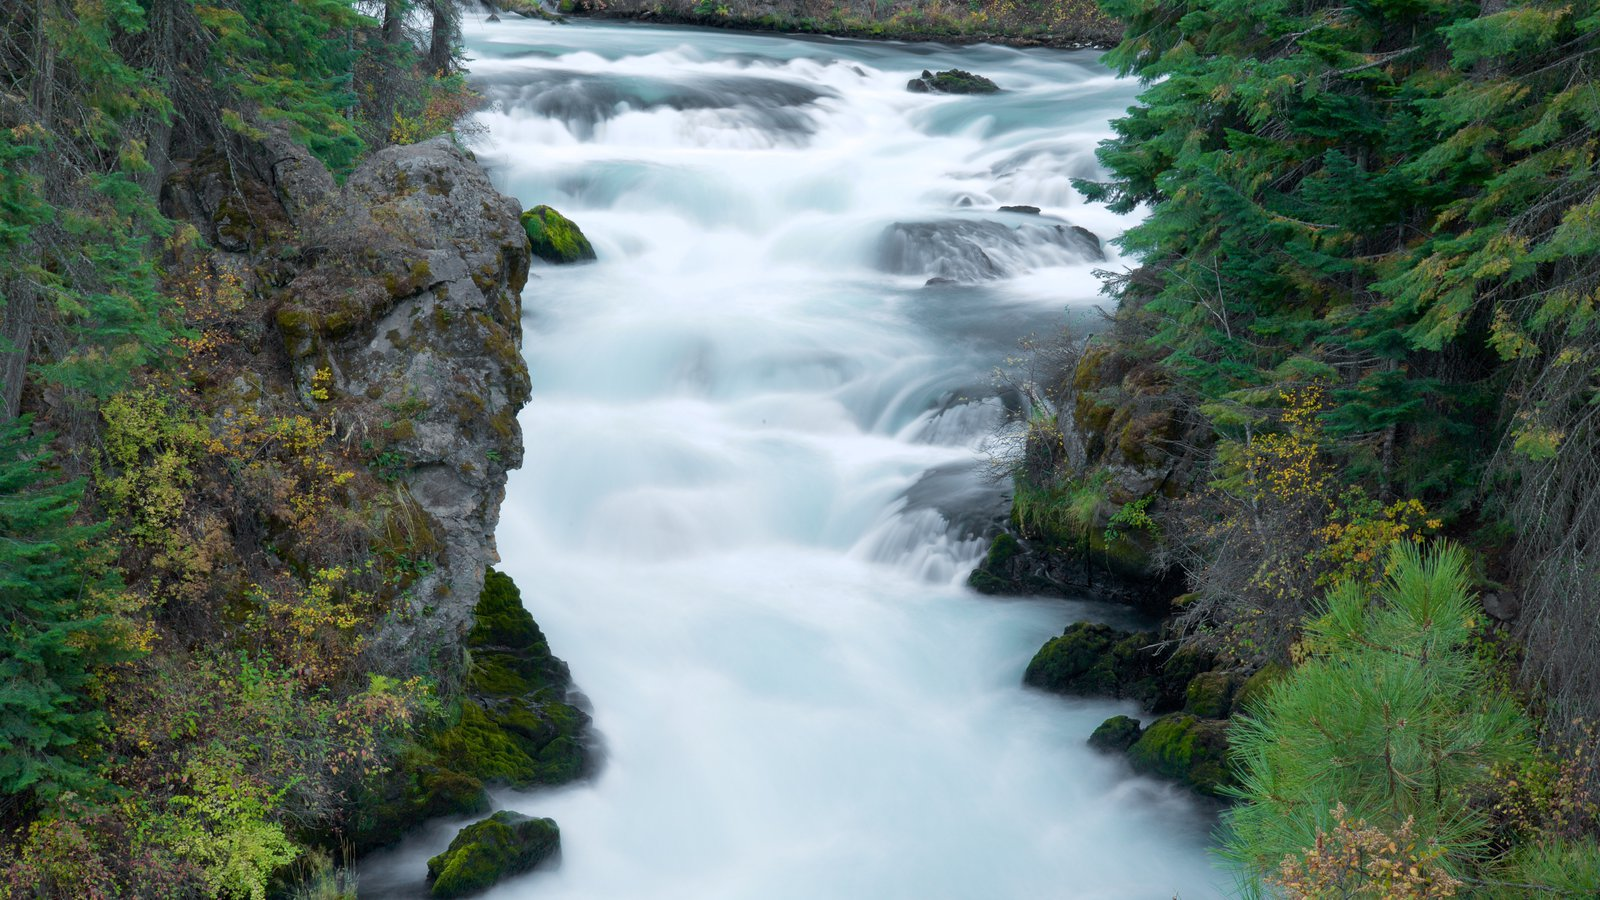 Deschutes National Forest ofreciendo rápidos